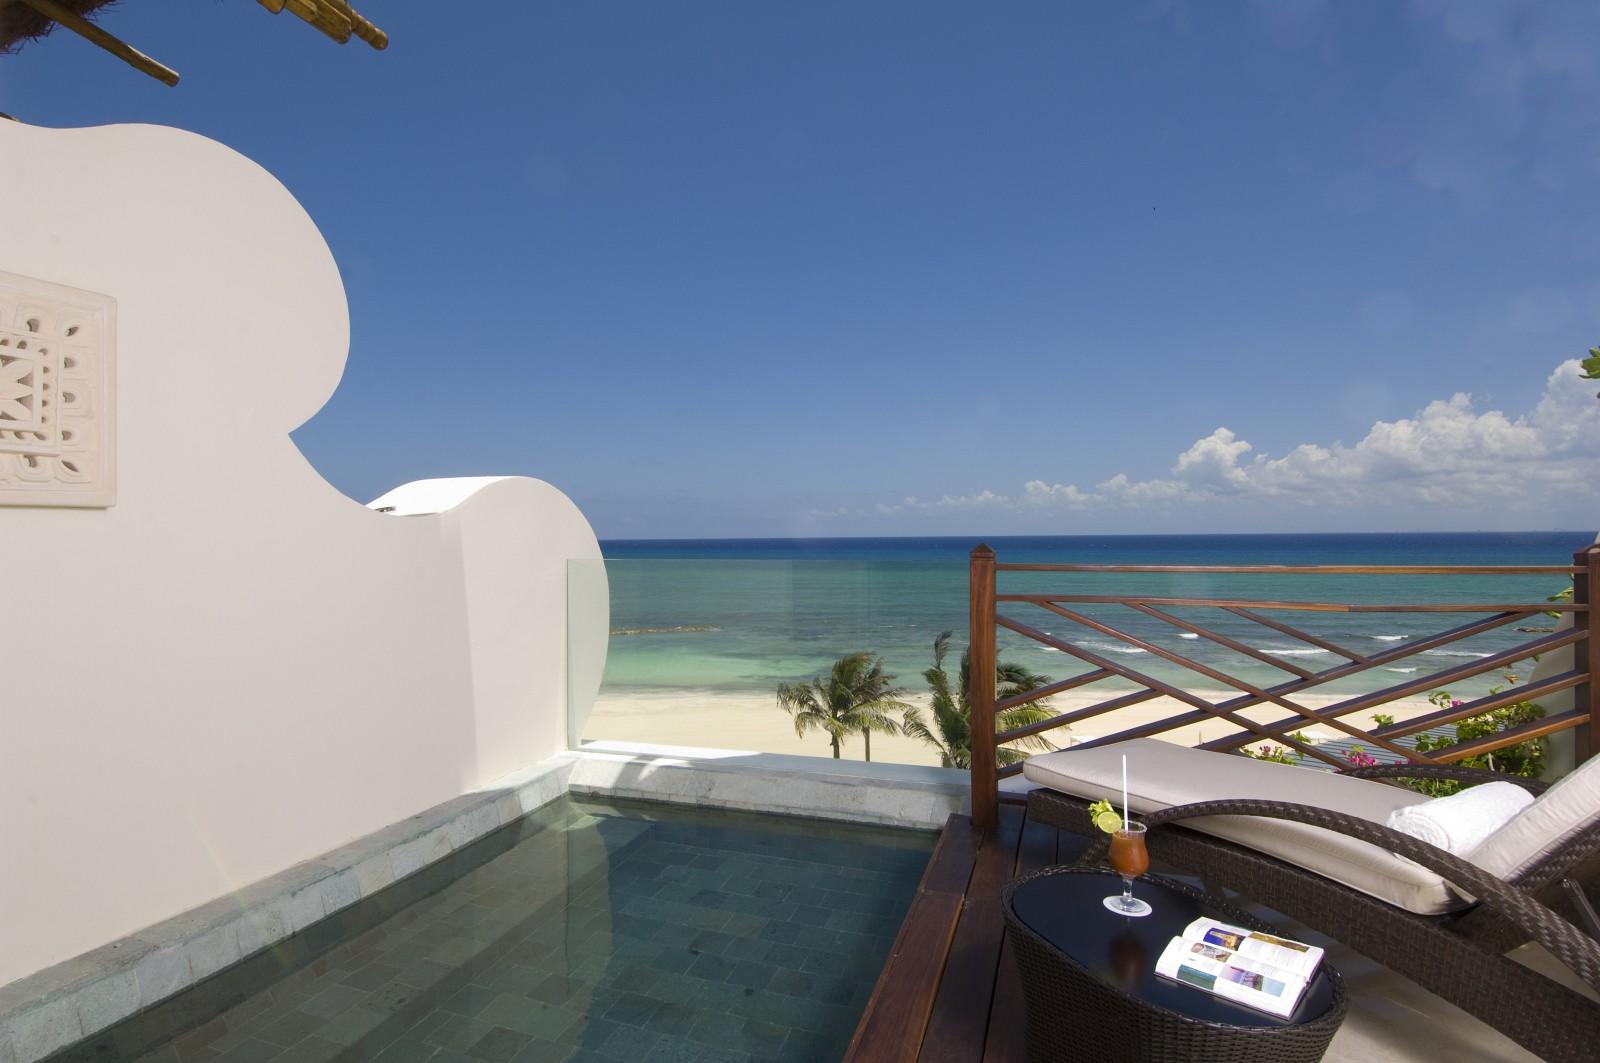 Travel Agency All-Inclusive Resort Grand Velas Riviera Maya 039